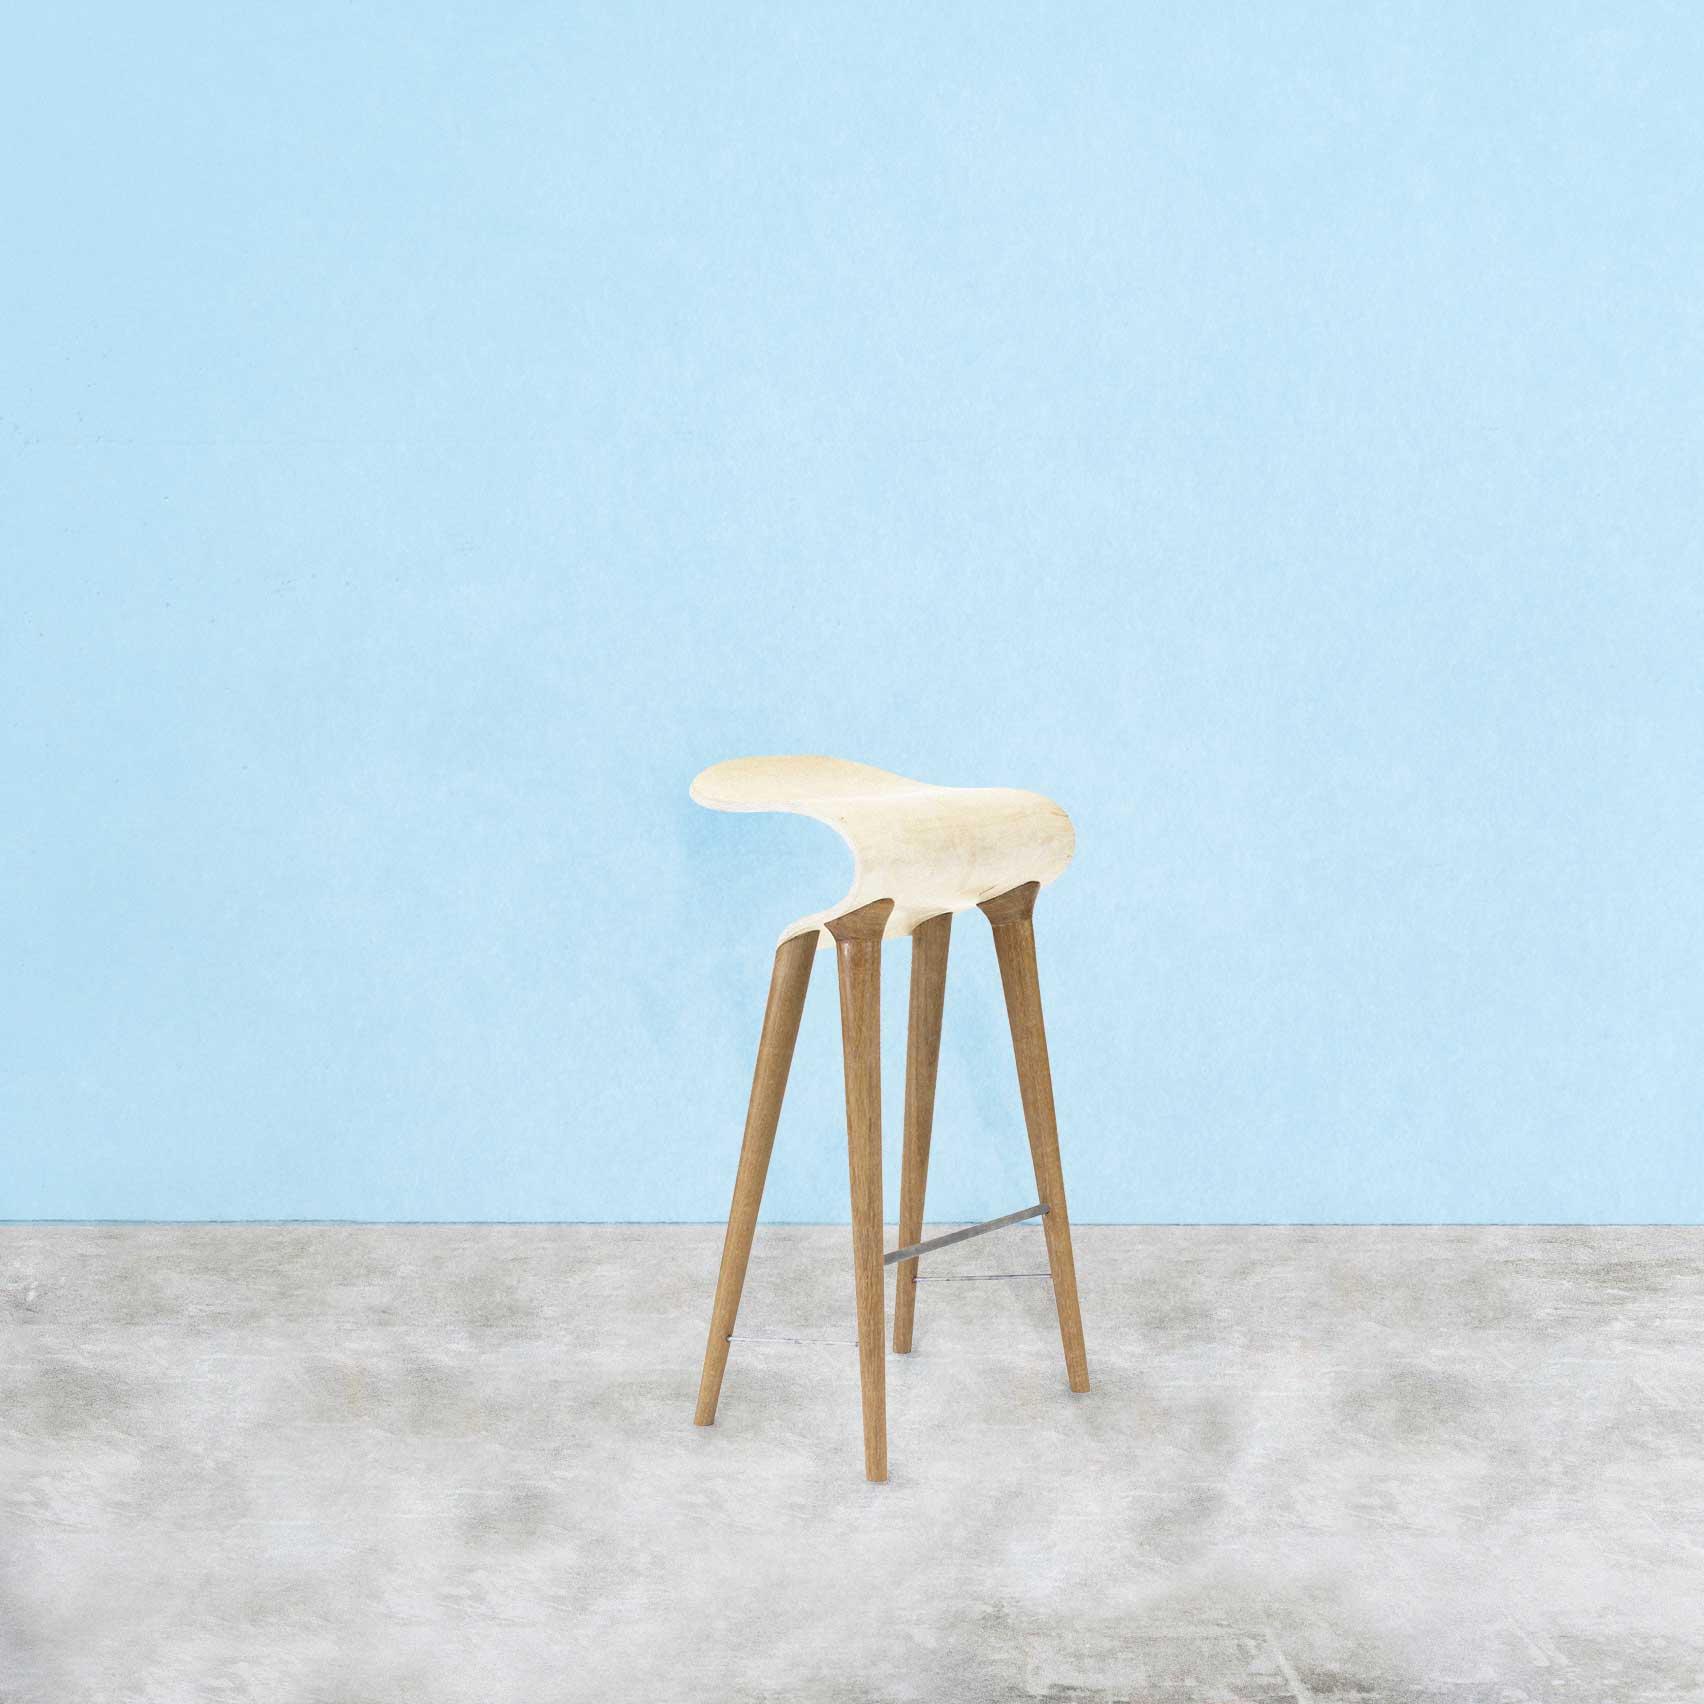 nick_stormont_LE_MILE_Magazine_LE_MILE_SeLECTED_European_Furniture_Design_2018.jpg